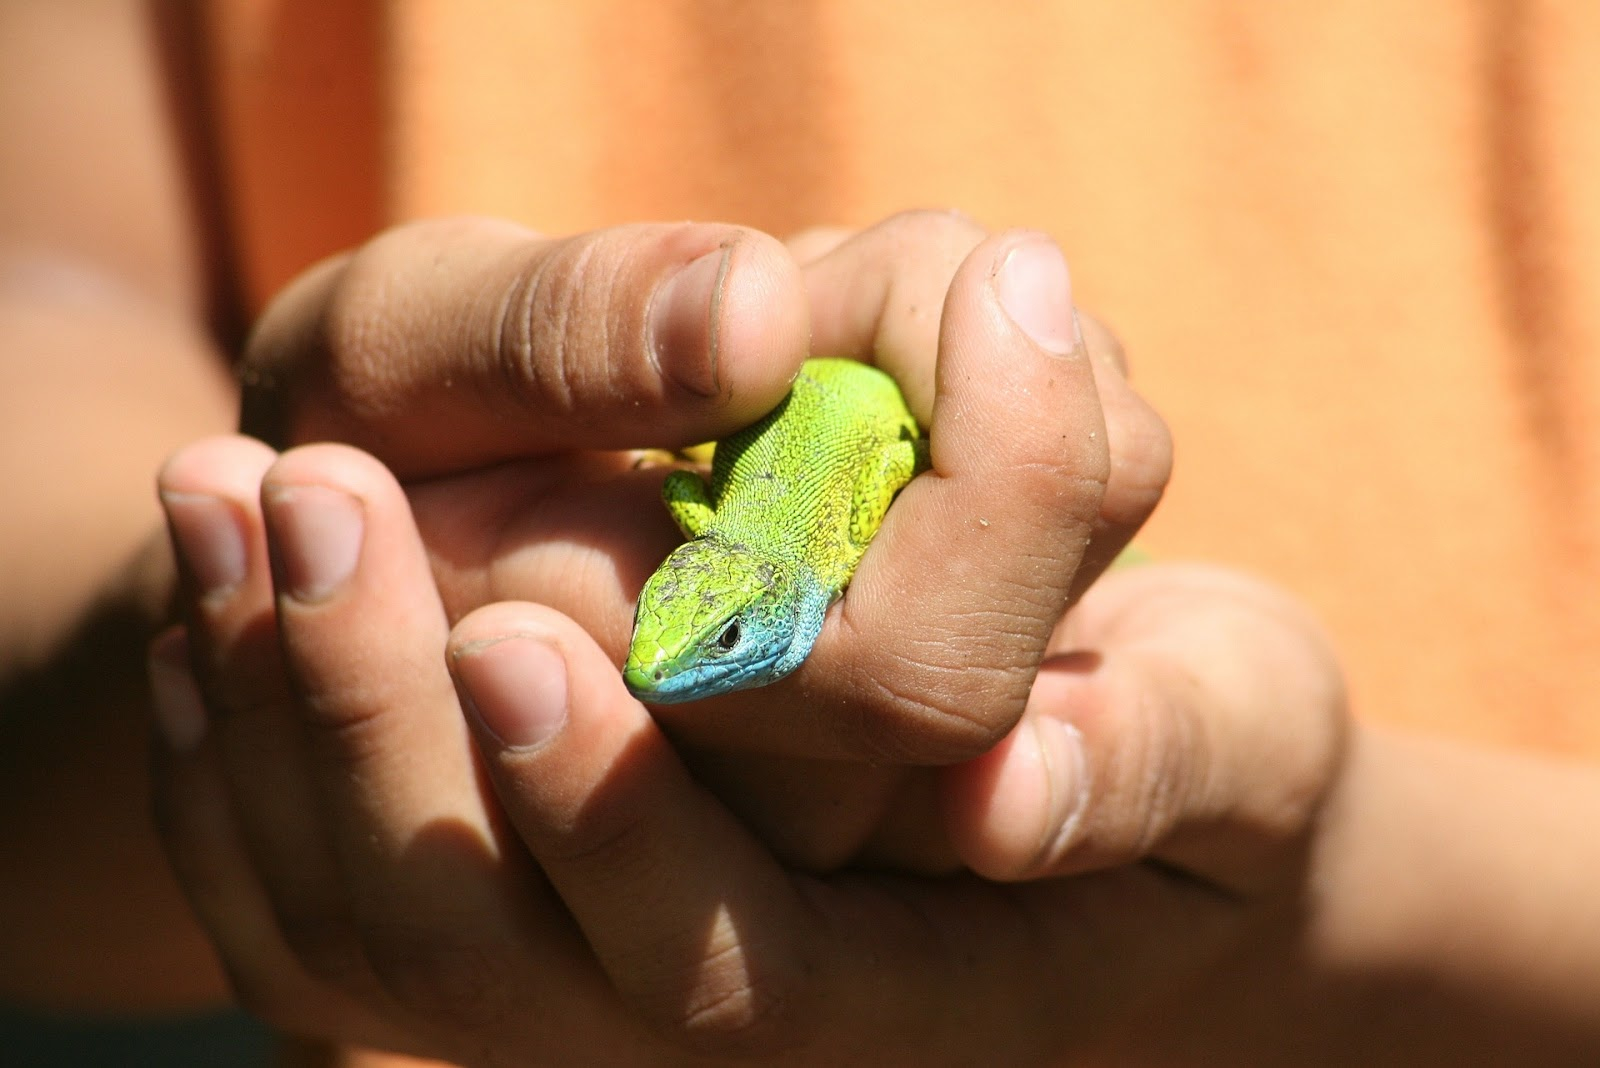 Kid hands holding lizard